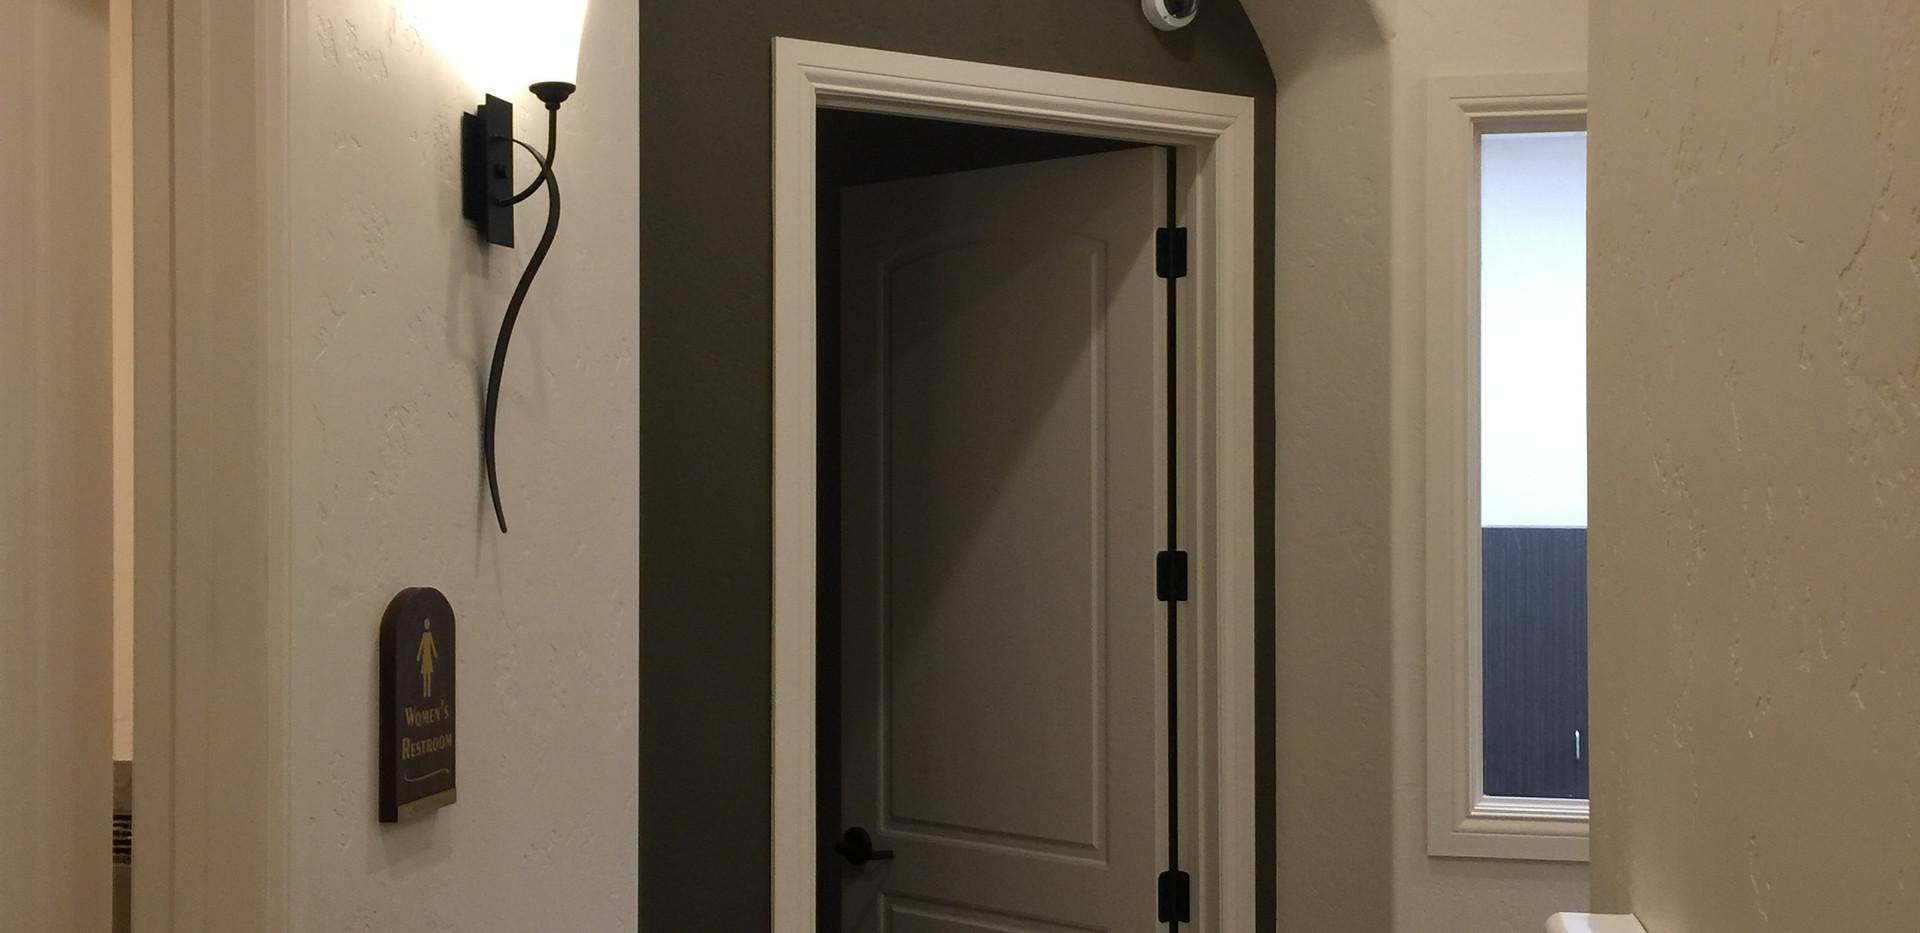 Phenix Salon Arch